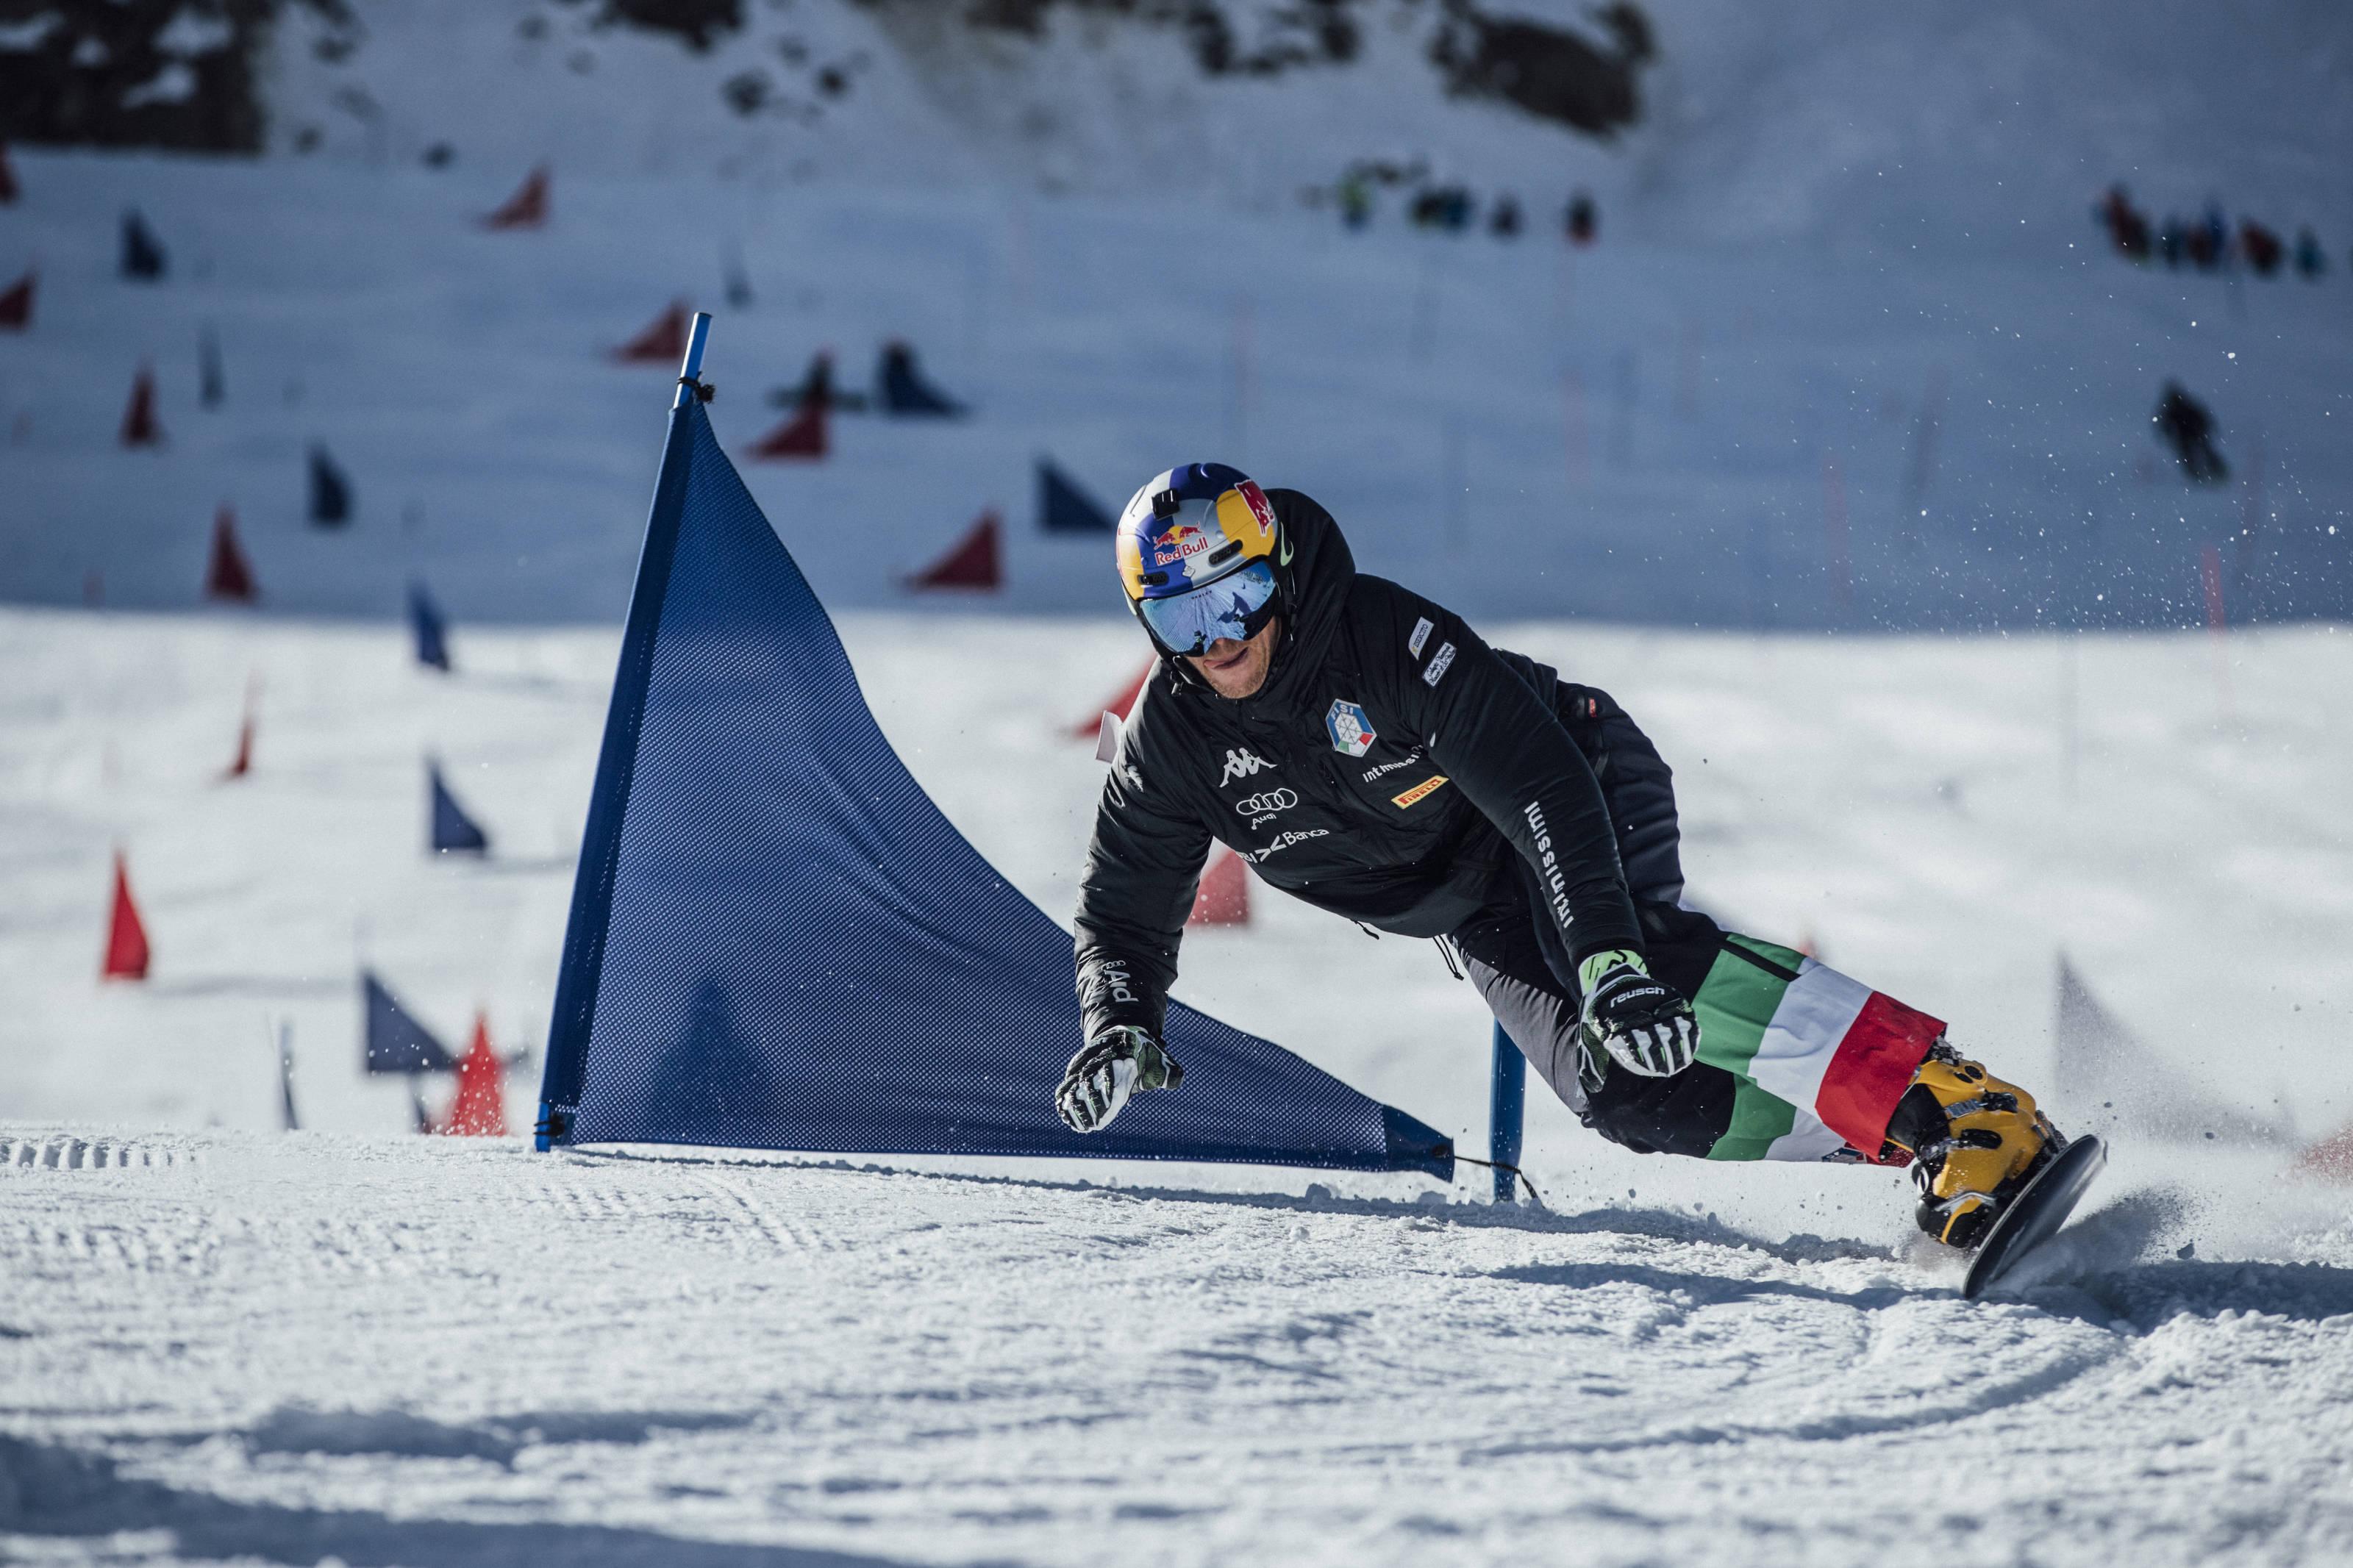 Olimpiadi Invernali di PyeongChang 2018 Roland Fischnaller